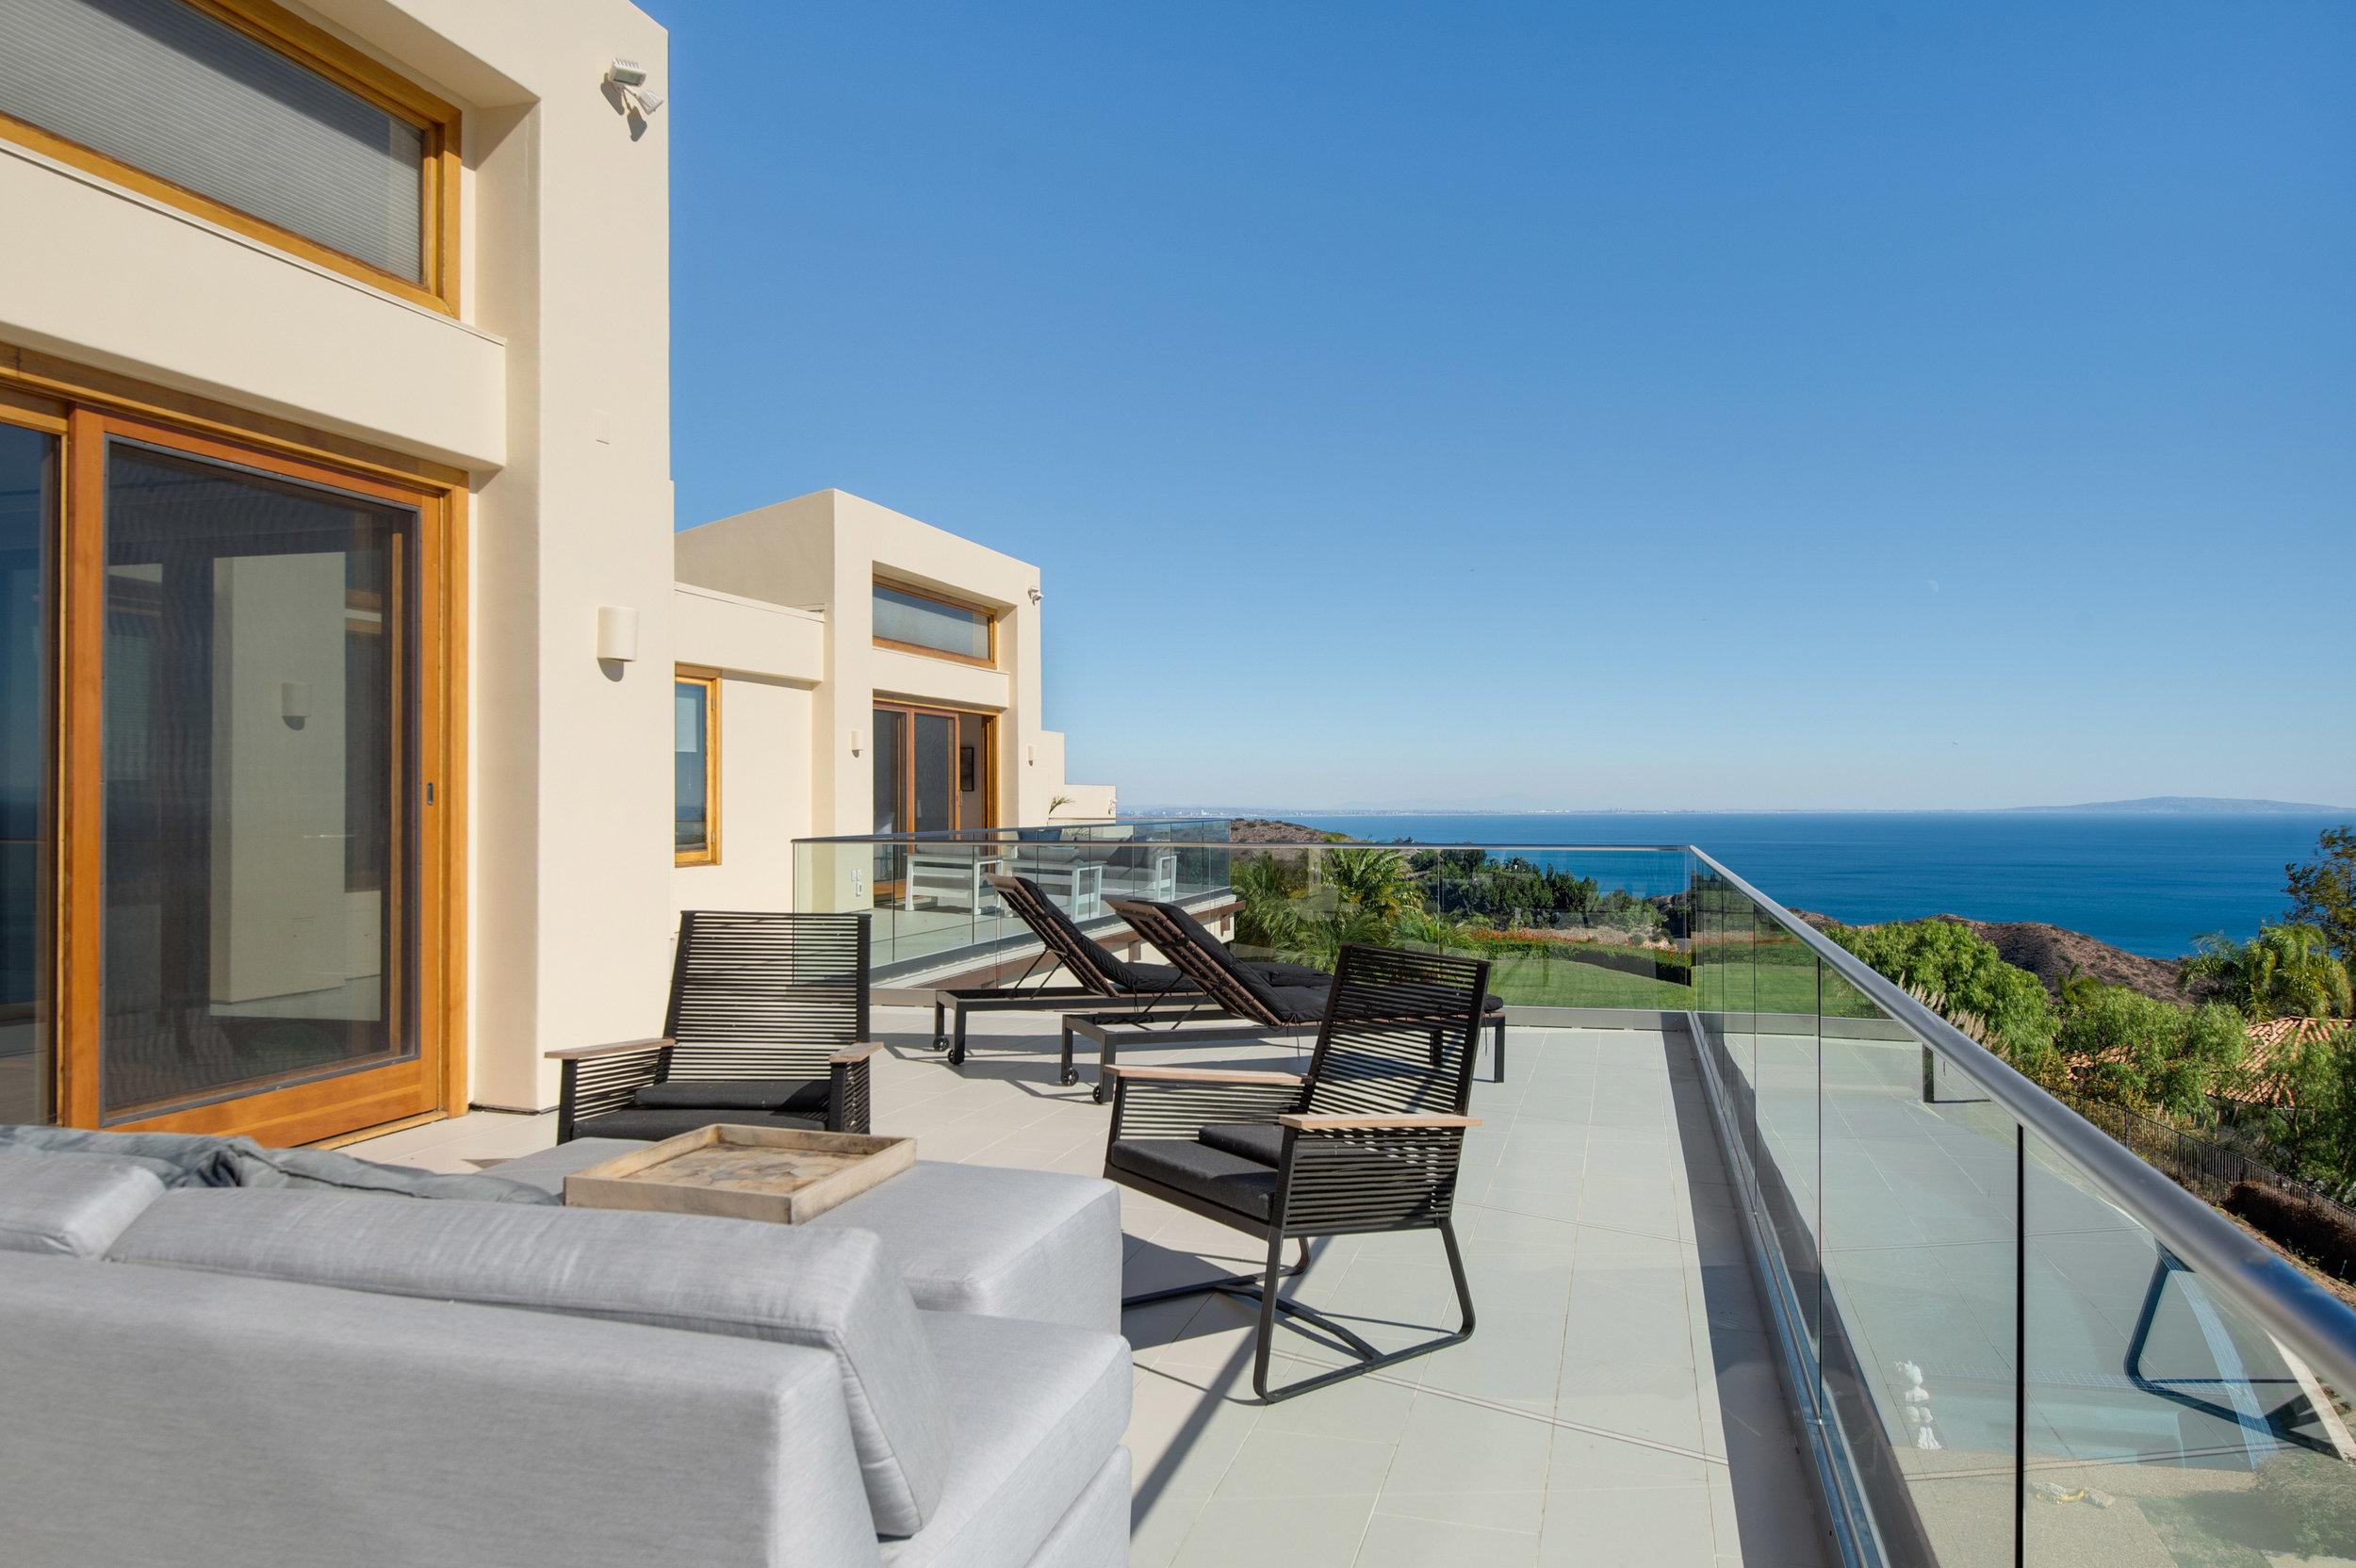 021 Deck Ocean View 27475 Latigo Bay View Drive For Sale Lease The Malibu Life Team Luxury Real Estate.jpg